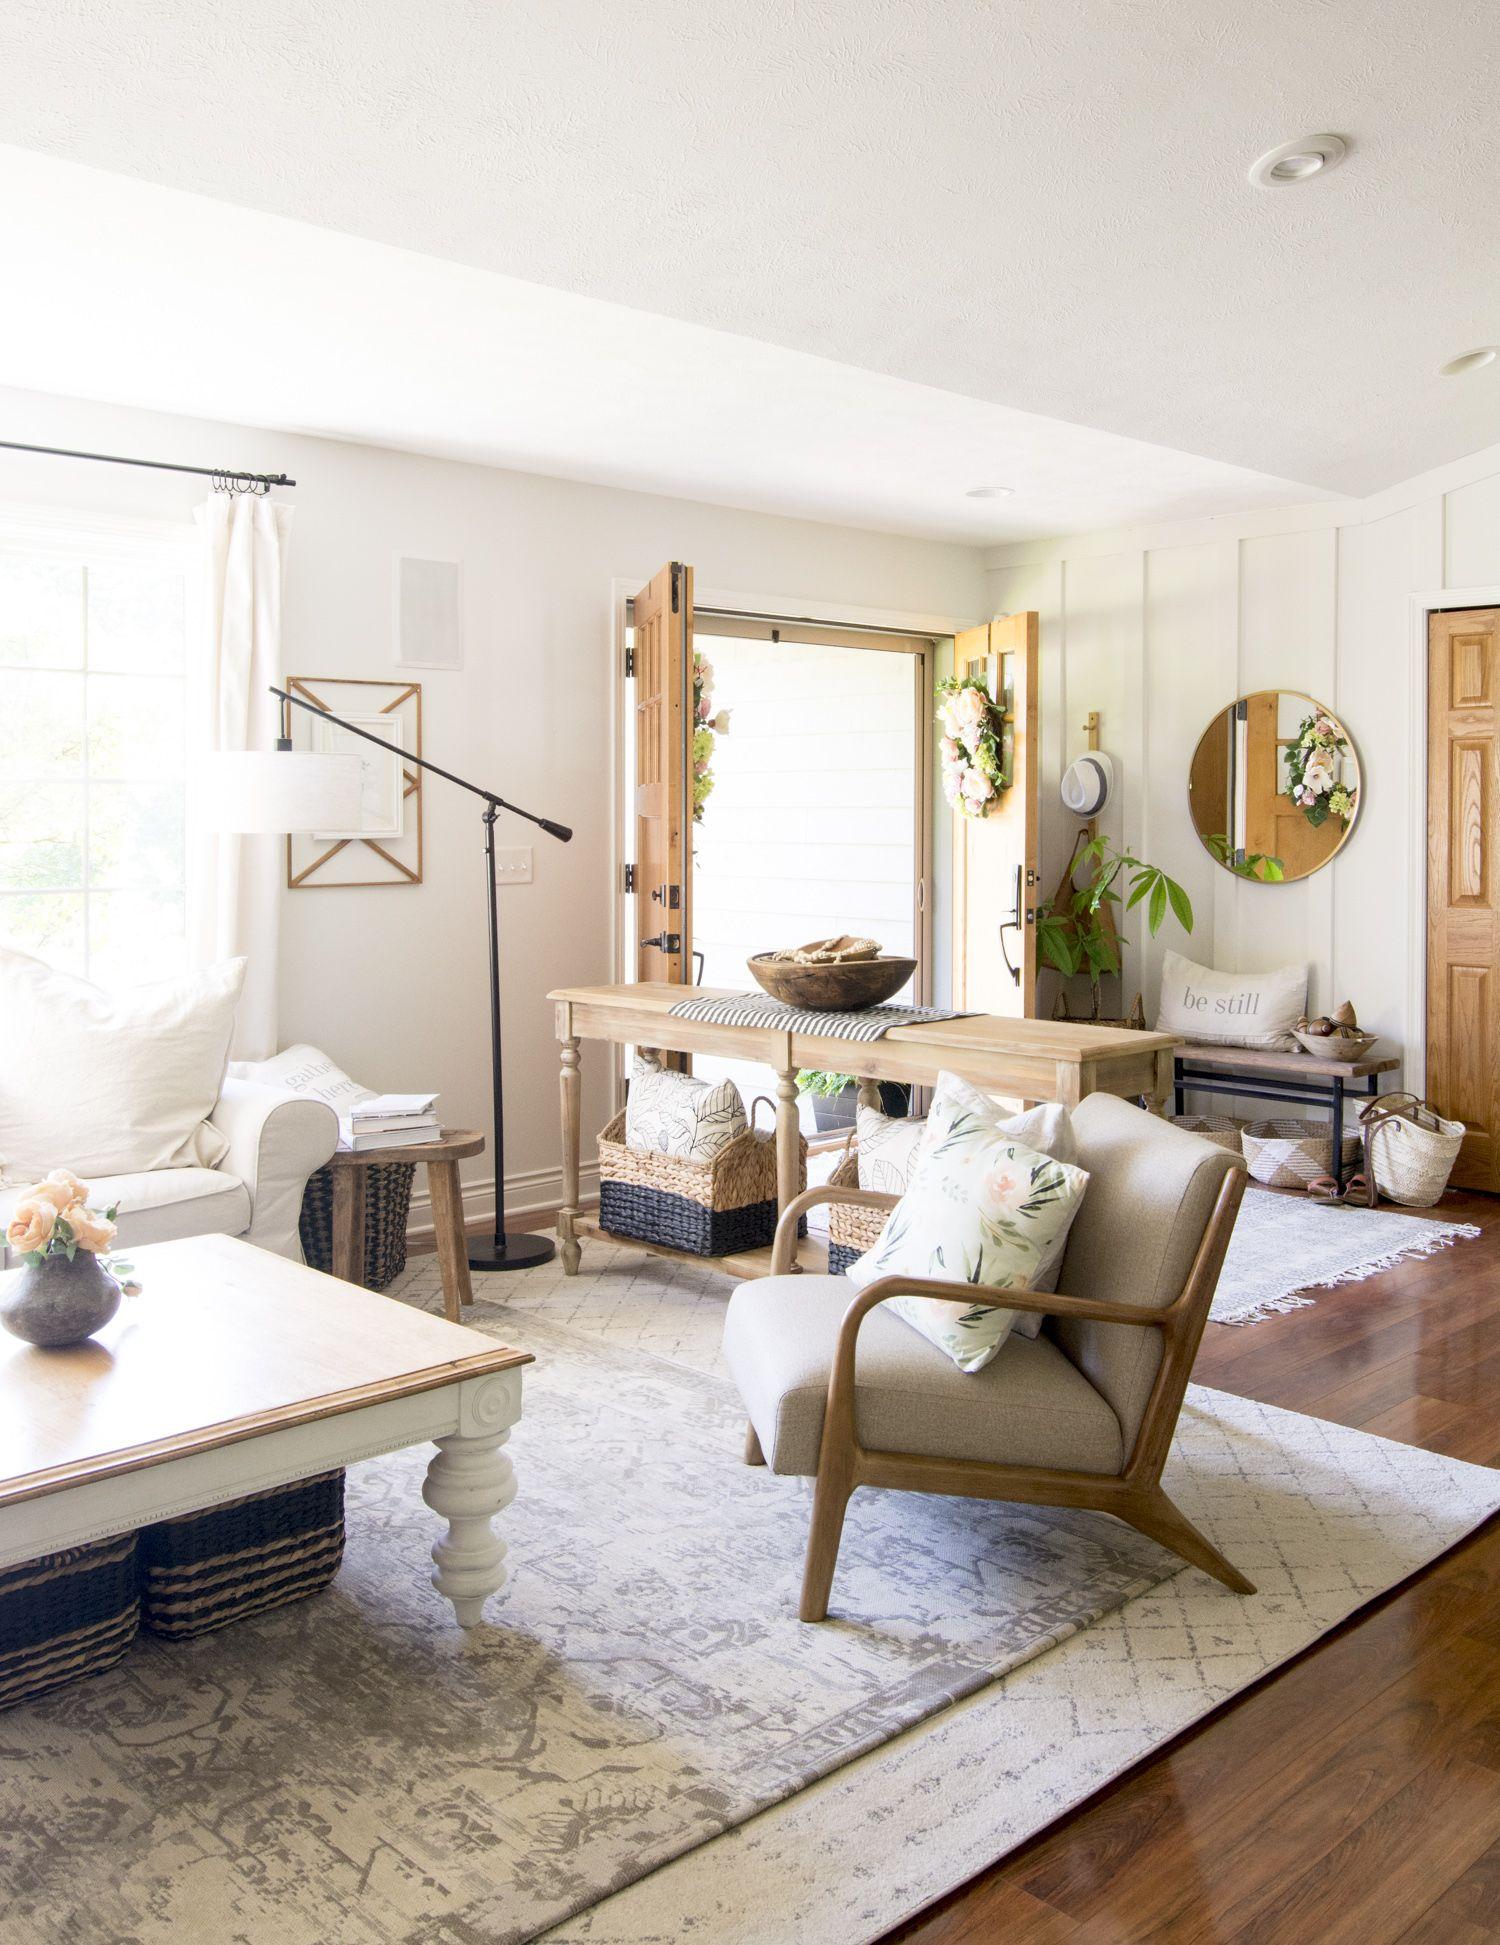 Simple Summer Decorations Home Tour Home Interior Interior Design